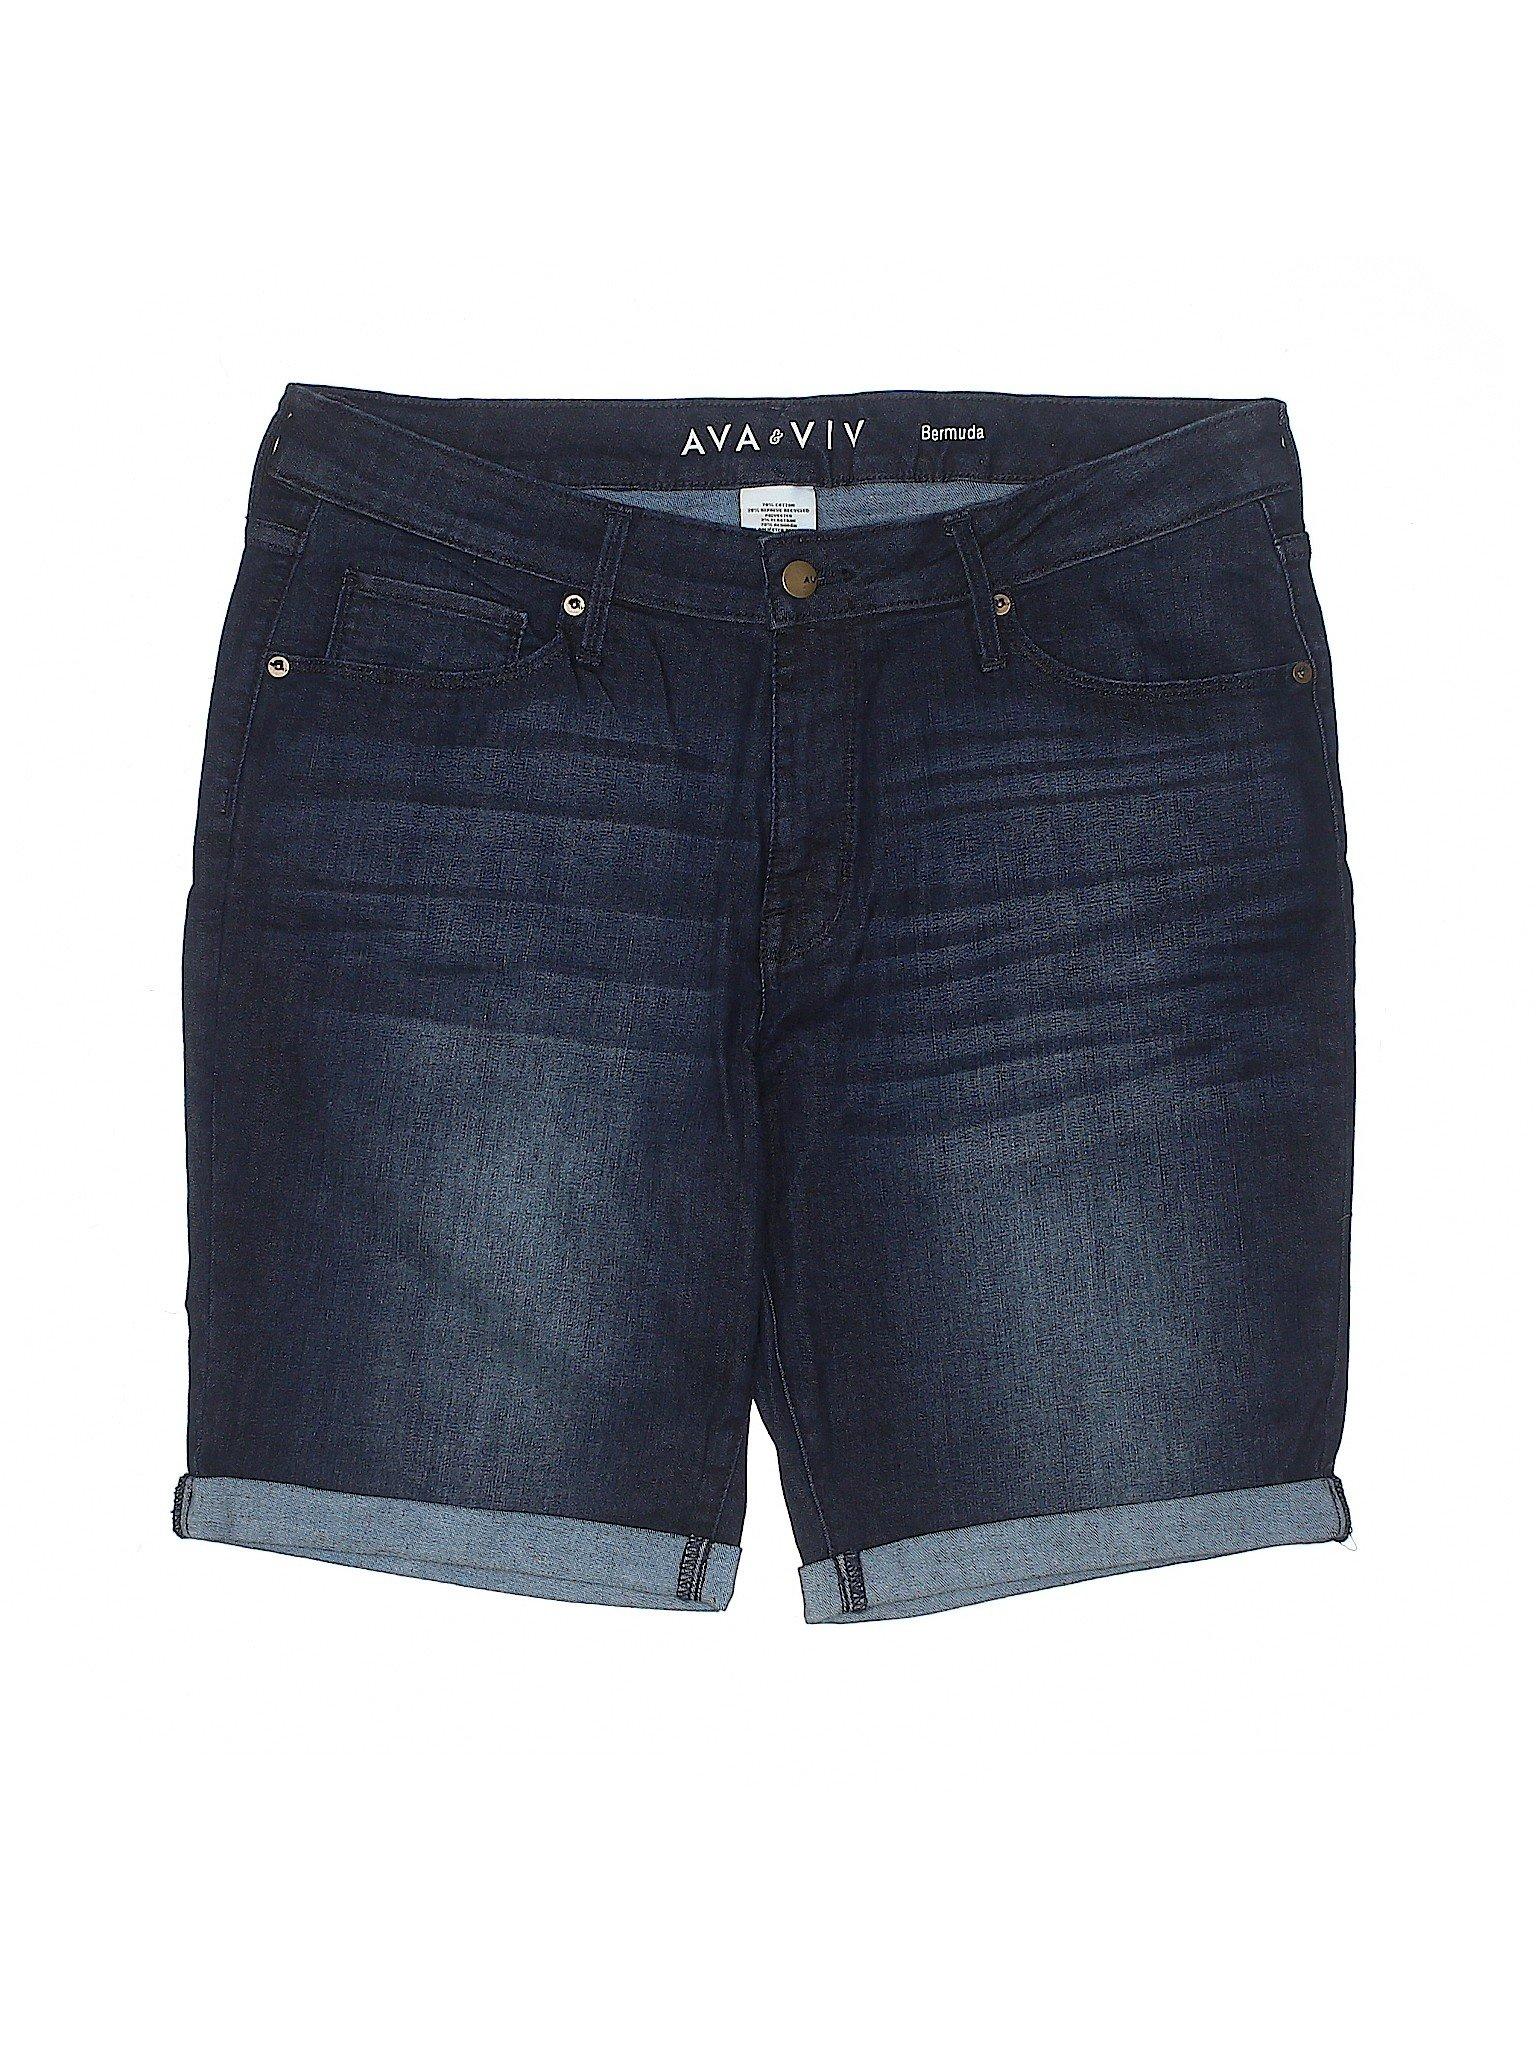 Boutique Denim amp; Ava Shorts Viv 8qxqYRZw